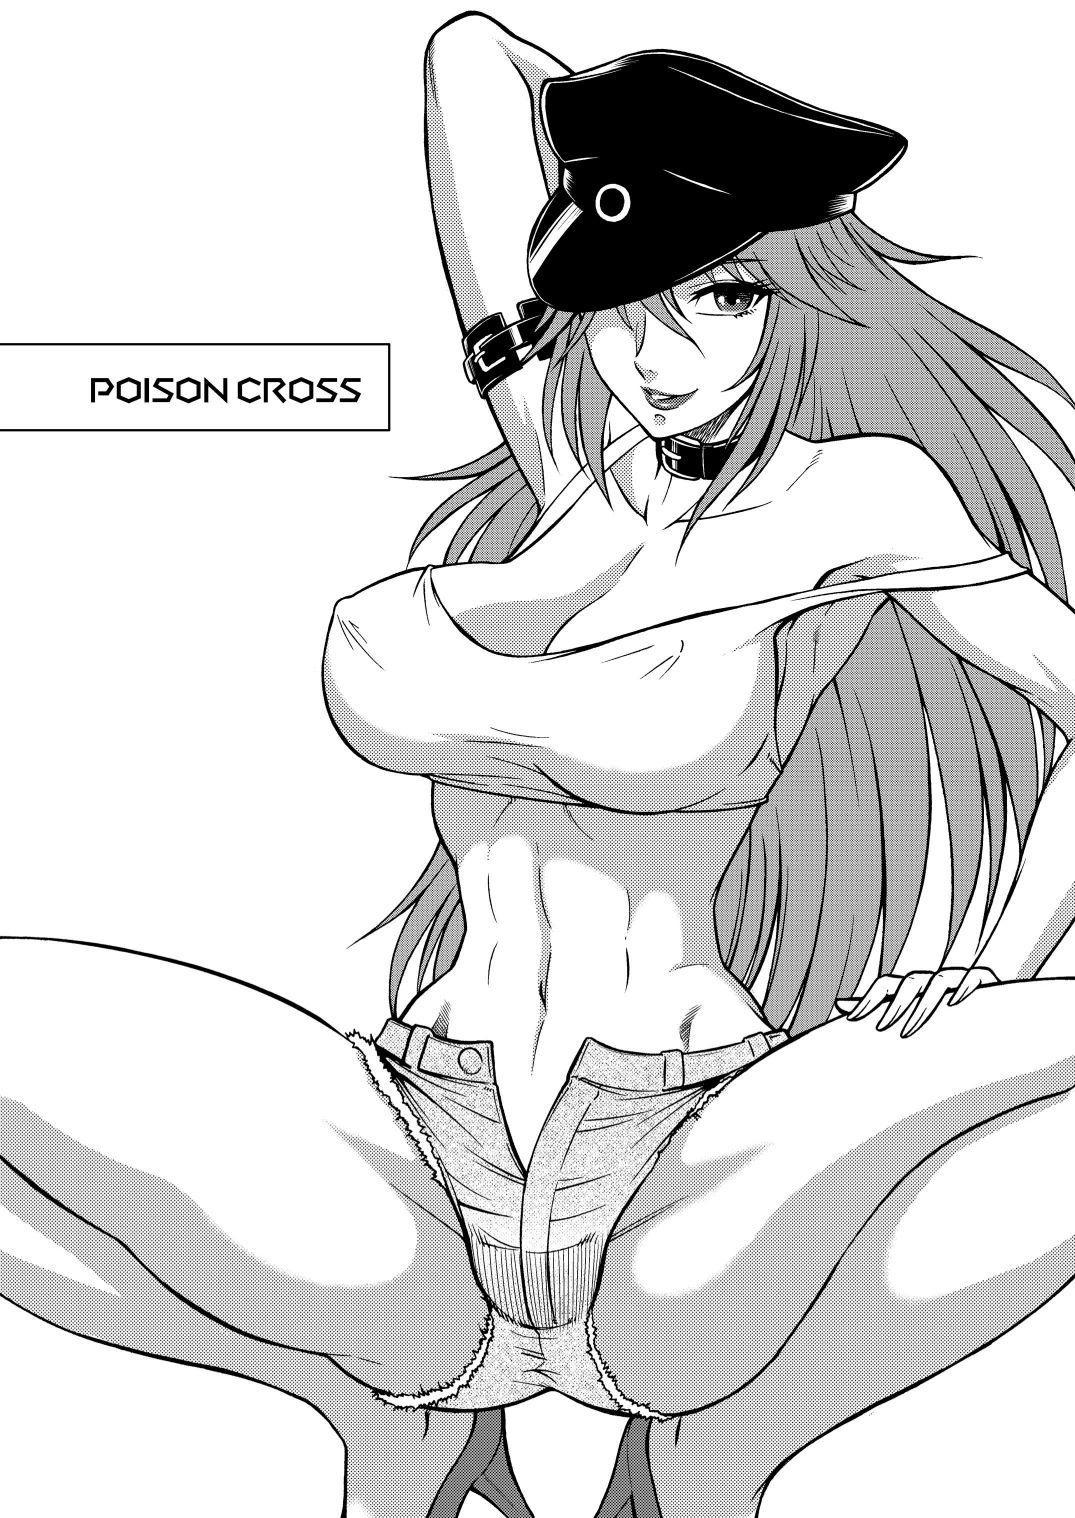 Poison cross 1